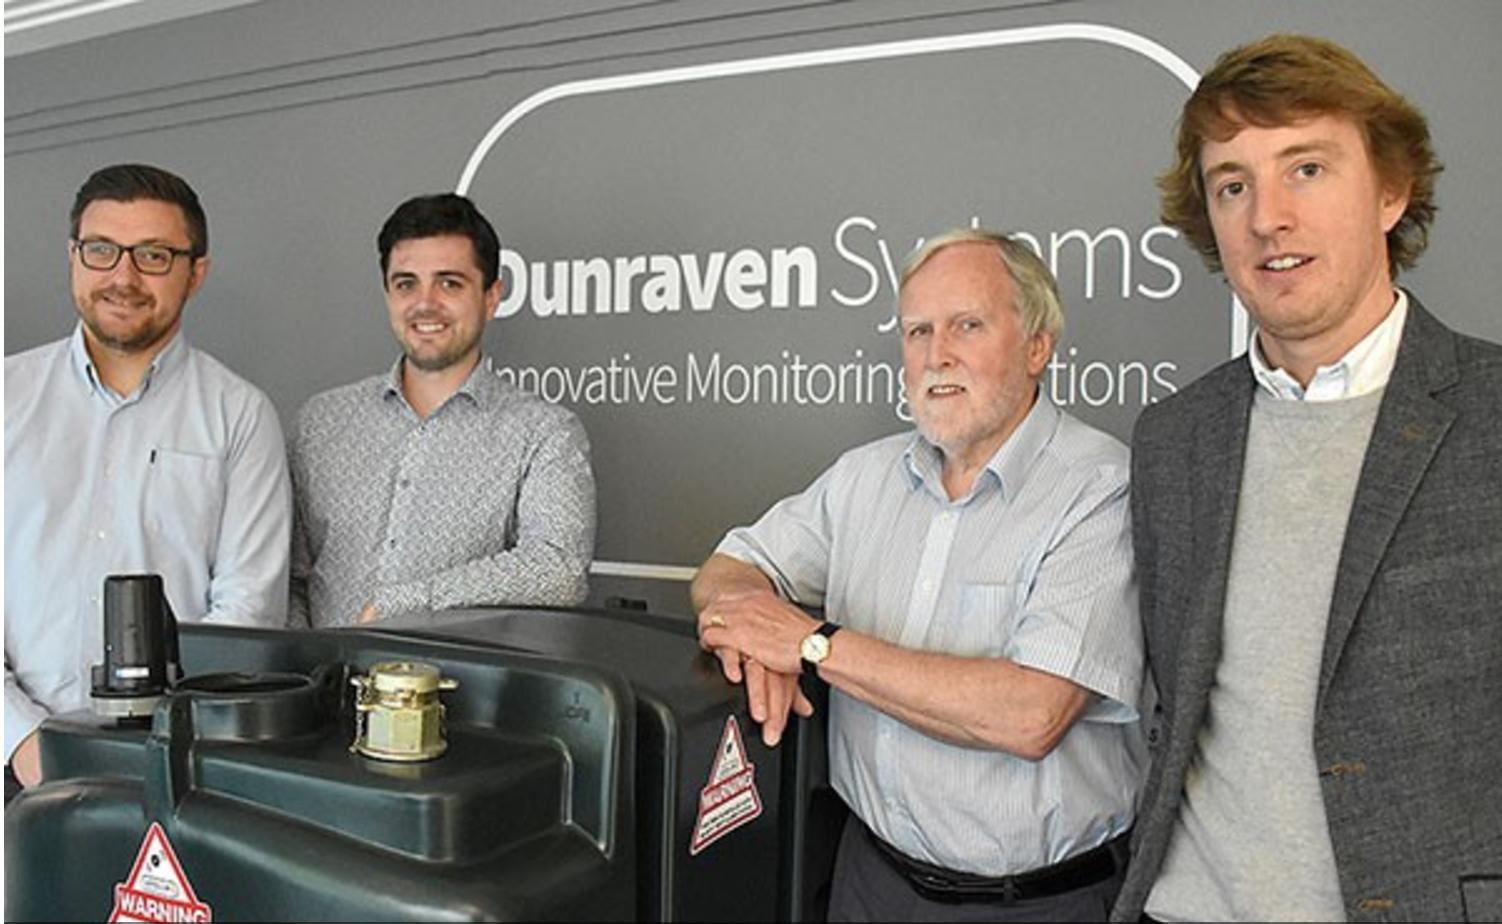 @VT_IoT y @DunravenSystems firman acuerdo de suscripción @Sigfox de 1 millón de euros